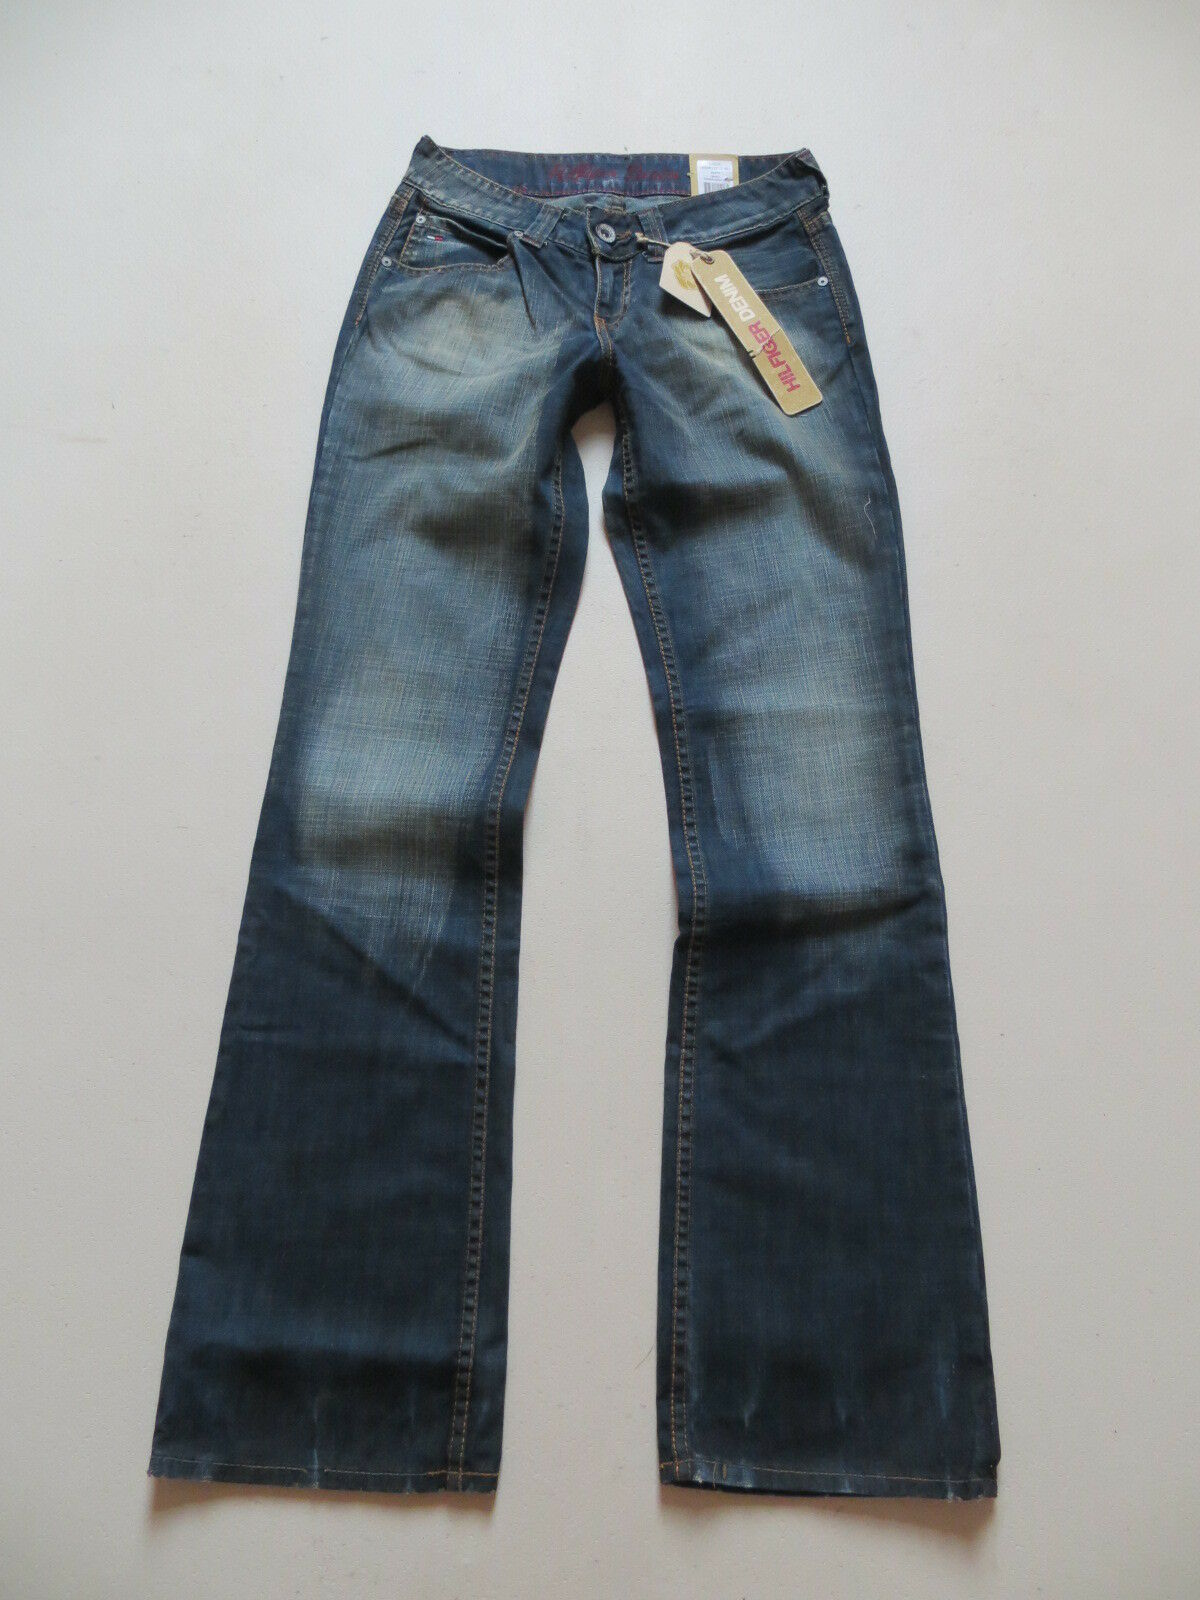 Tommy Hilfiger SALLY Jeans Hose W 27  L 34 NEU   Vintage Washed Denim RAR   34